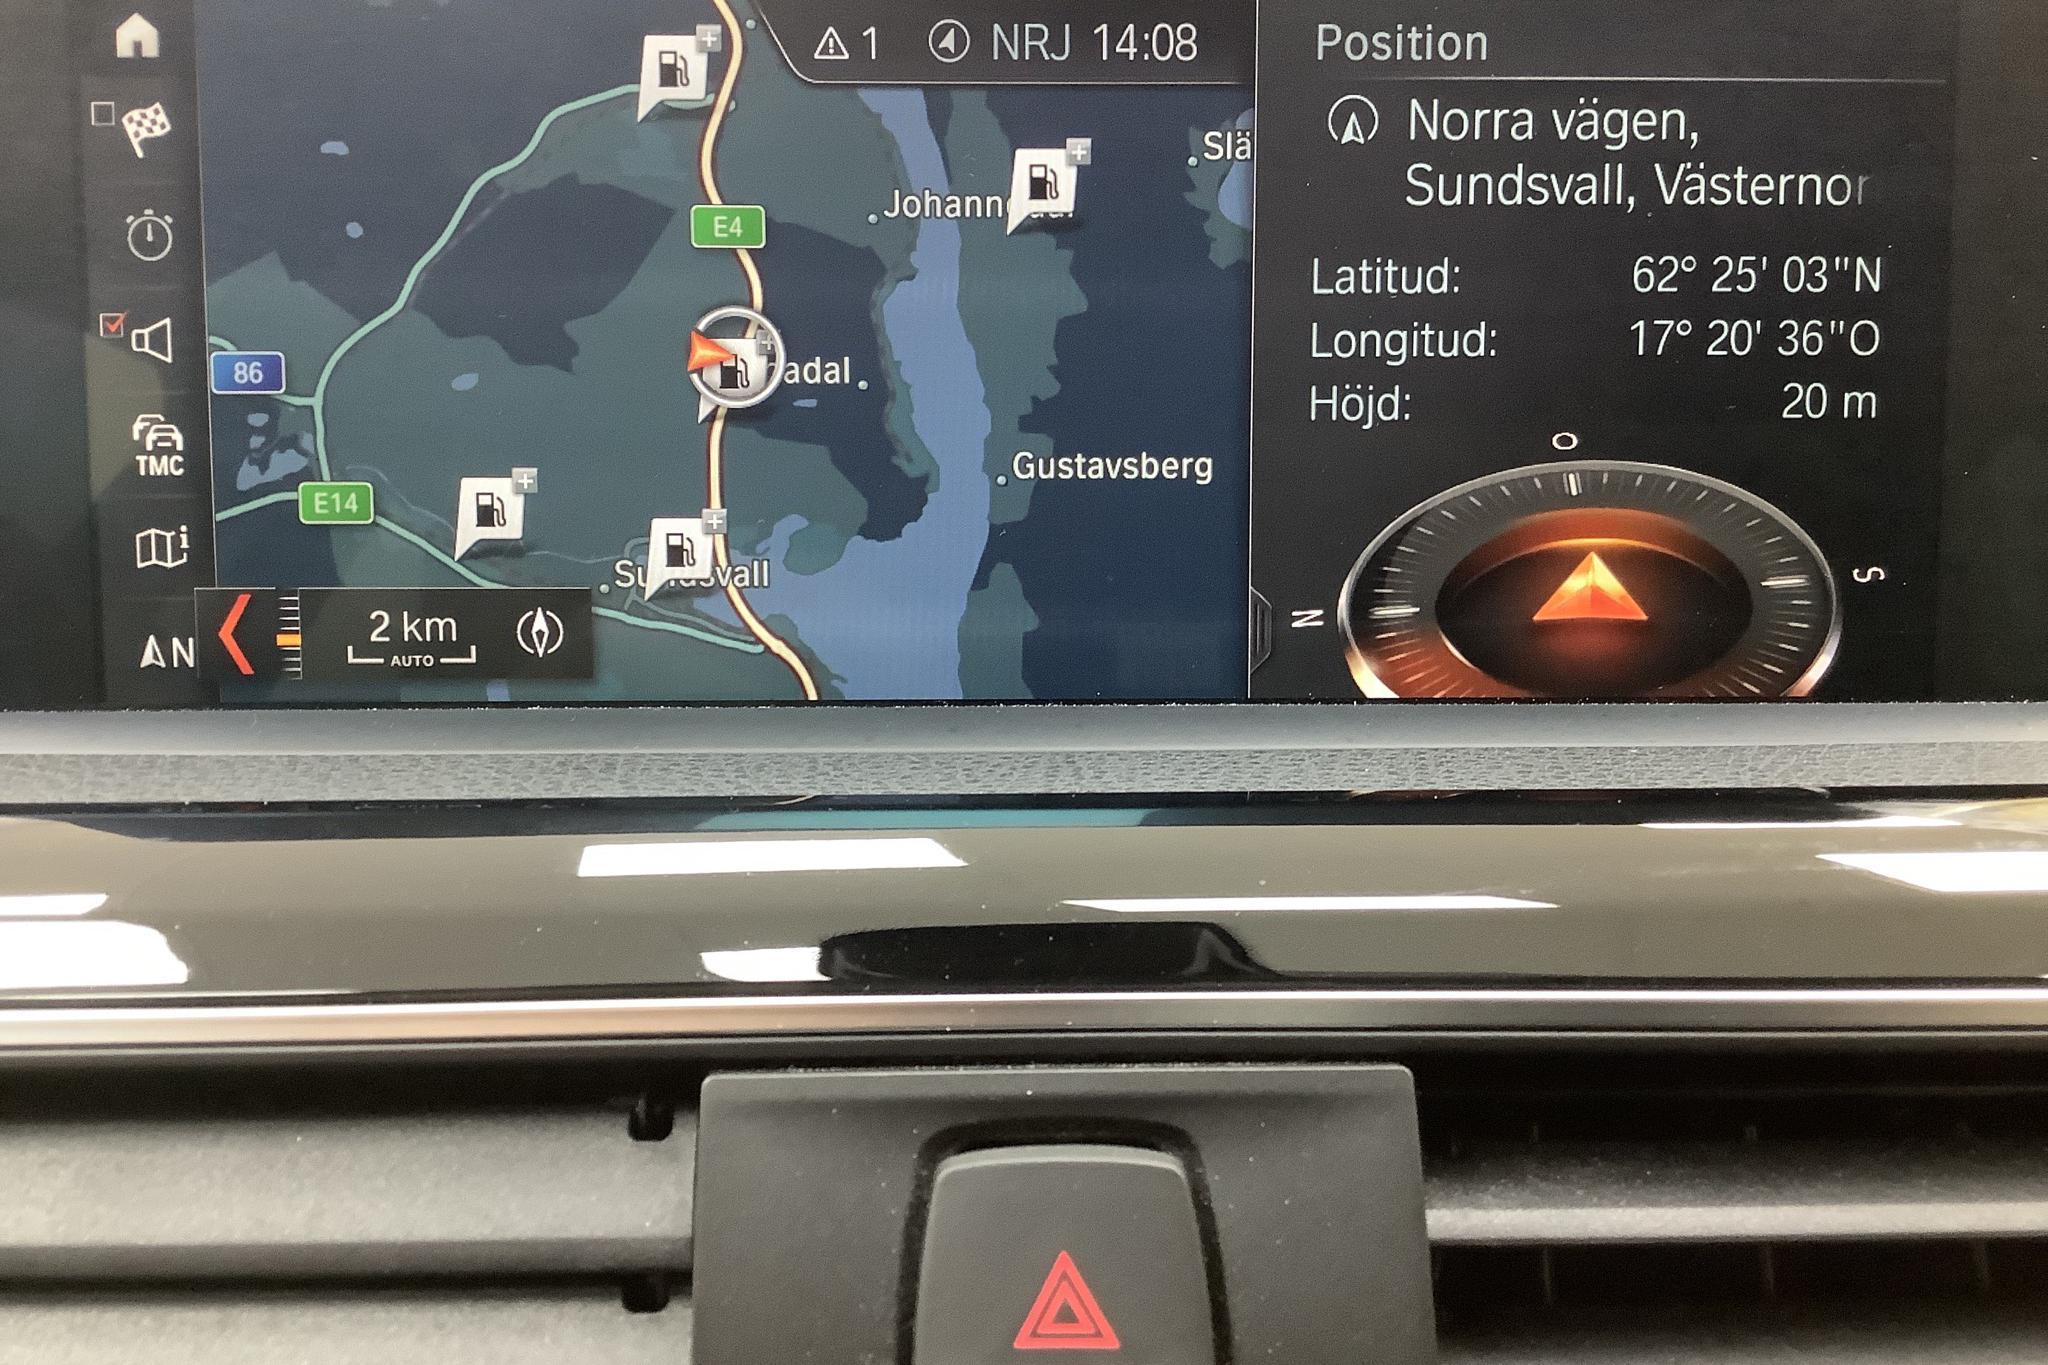 BMW 330e Sedan, F30 (252hk) - 67 030 km - Automatic - silver - 2018